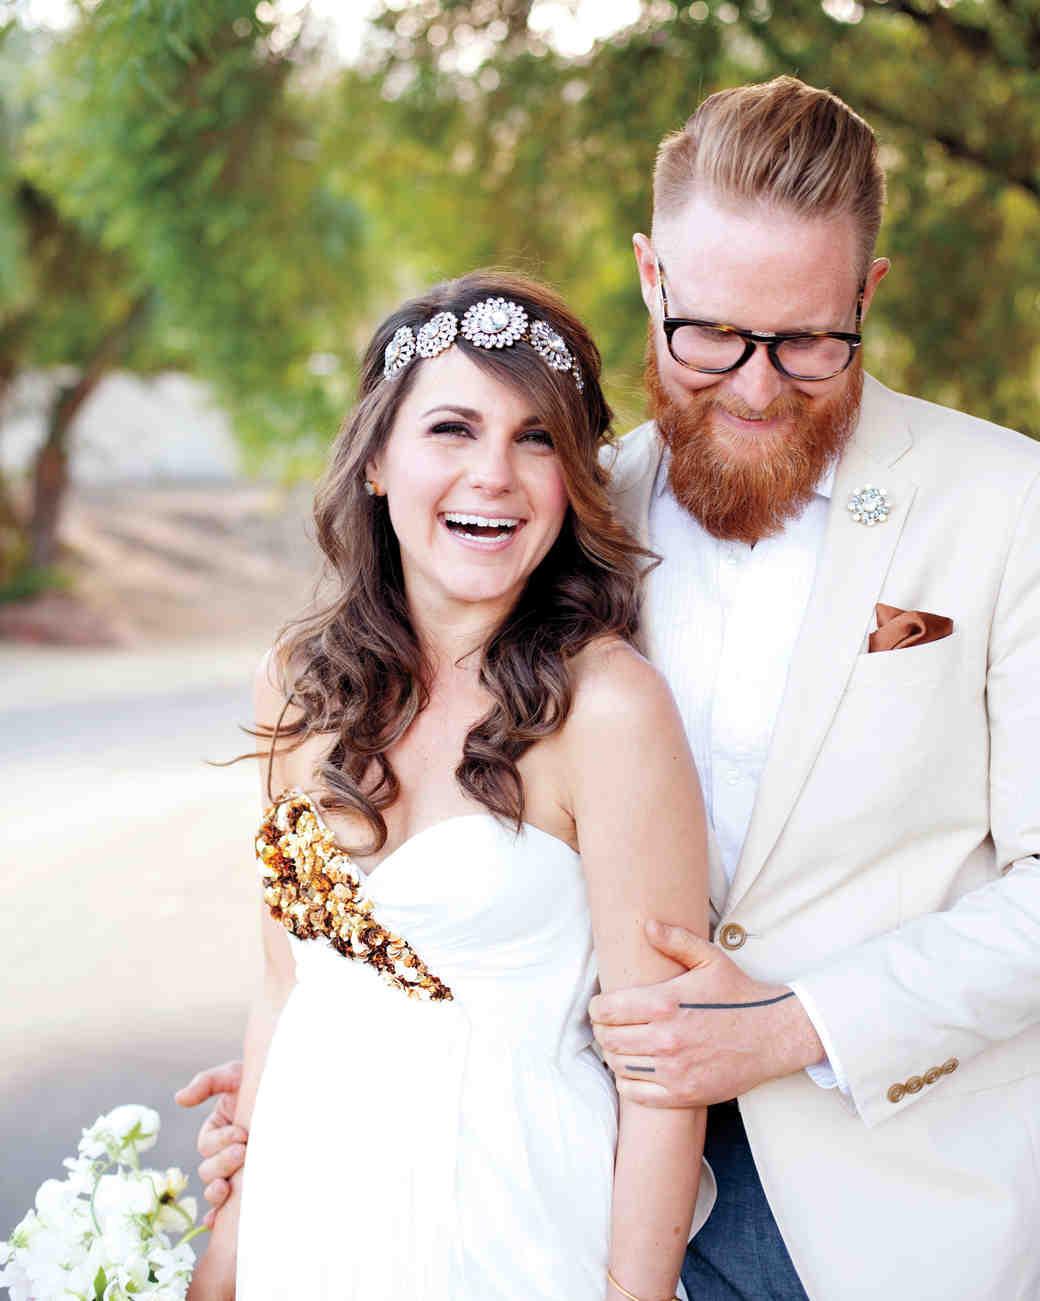 Edyta and Jareds FourDay Celebration in Palm Springs Martha